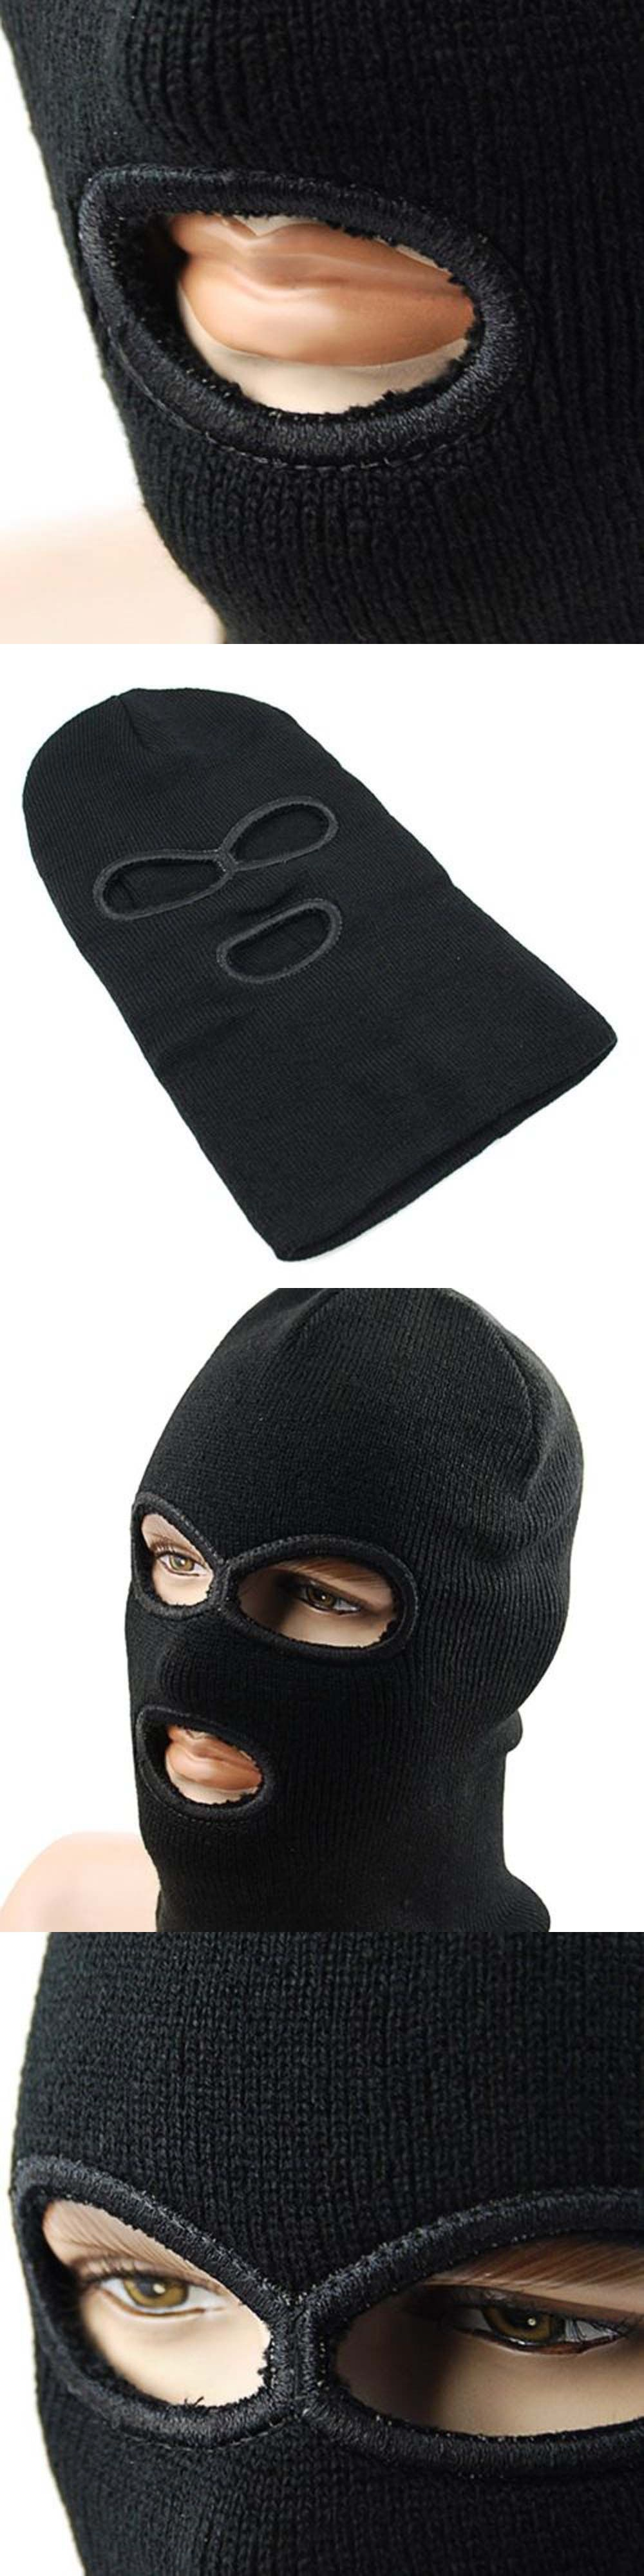 LINTOY 3 Hole Hot Mask Balaclava Black Knit Hat Face Shield Beanie Cap Snow  Winter Warm 43ef3a6f9685